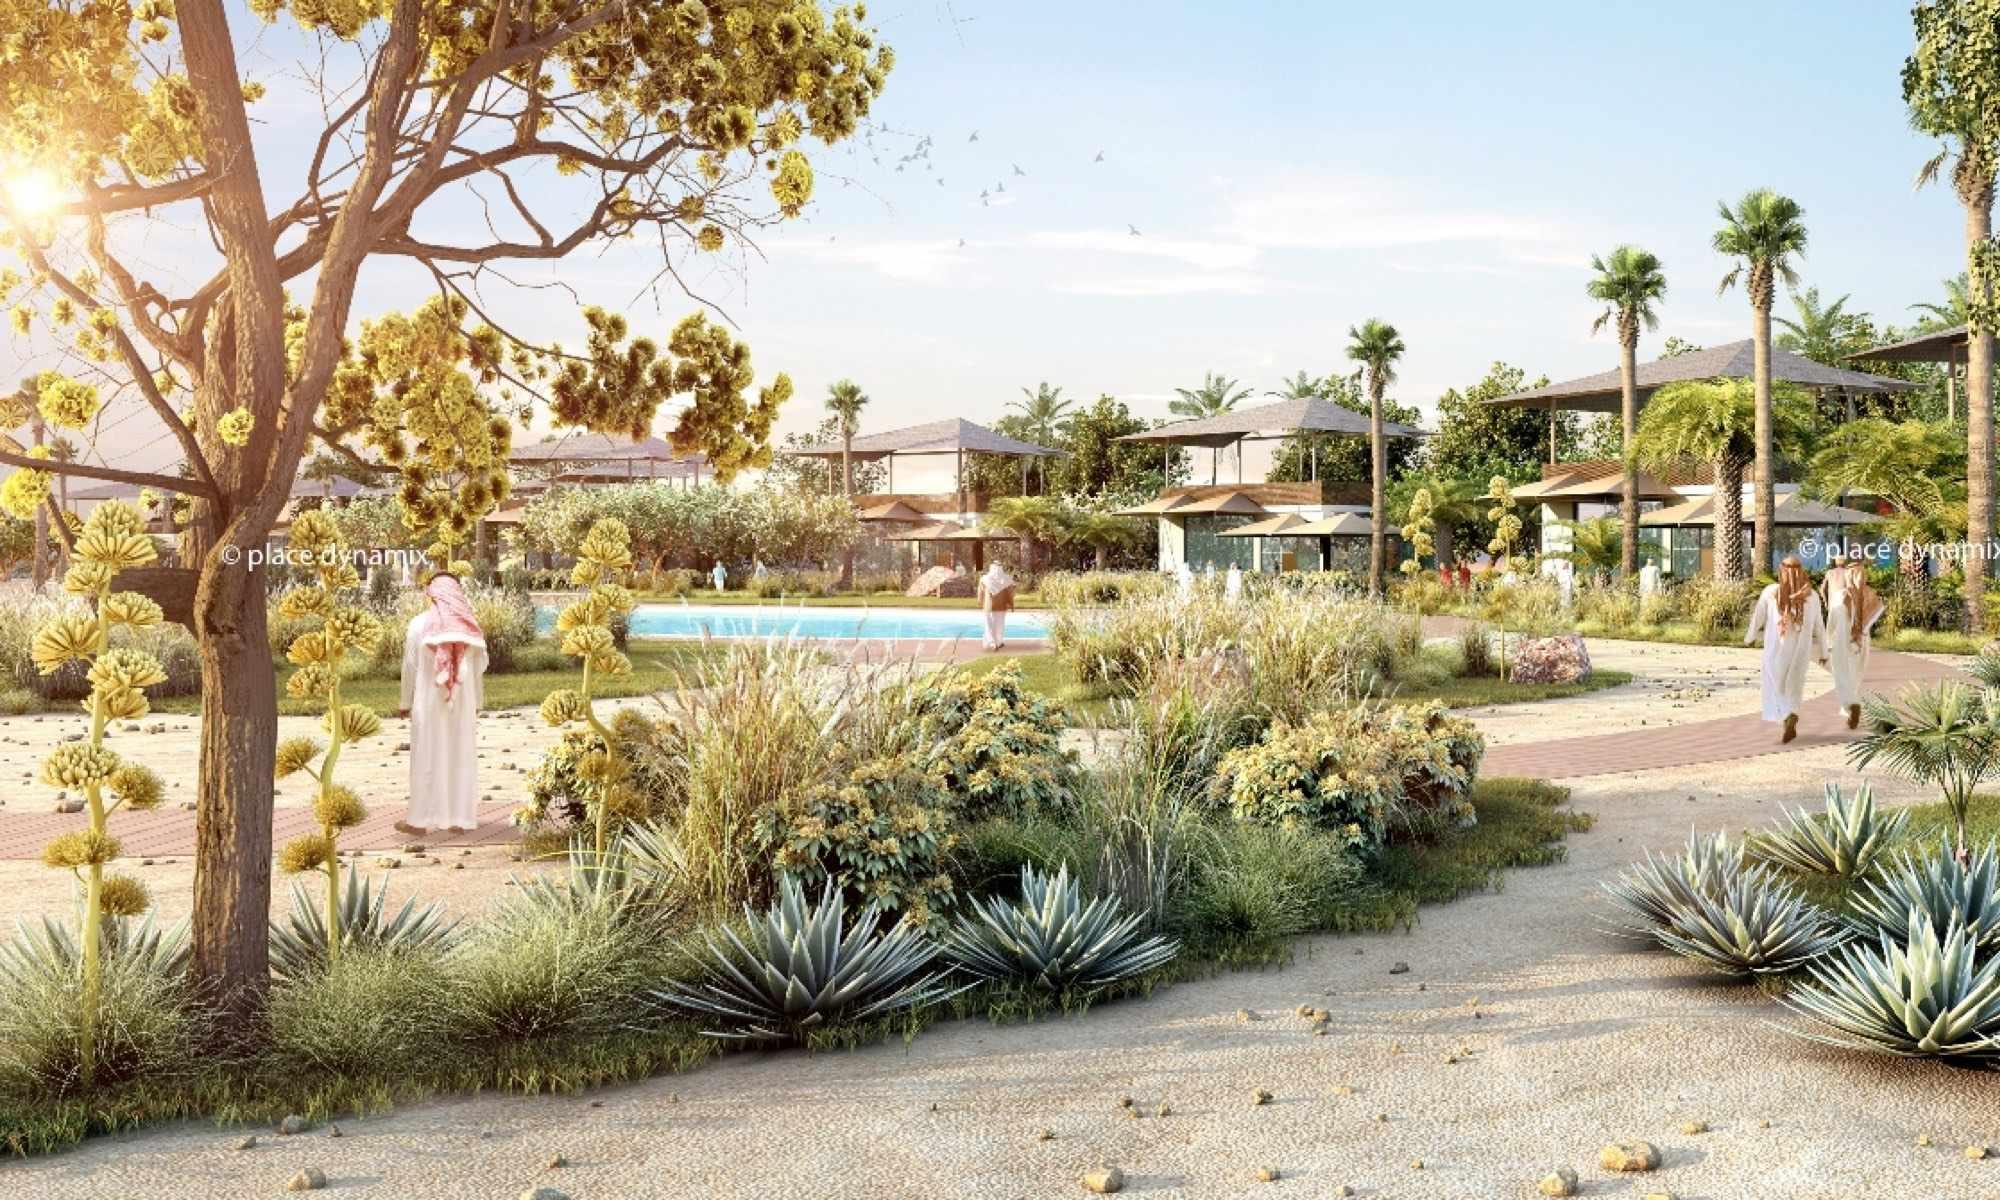 Desert Resort & Nature Interpretation Centre